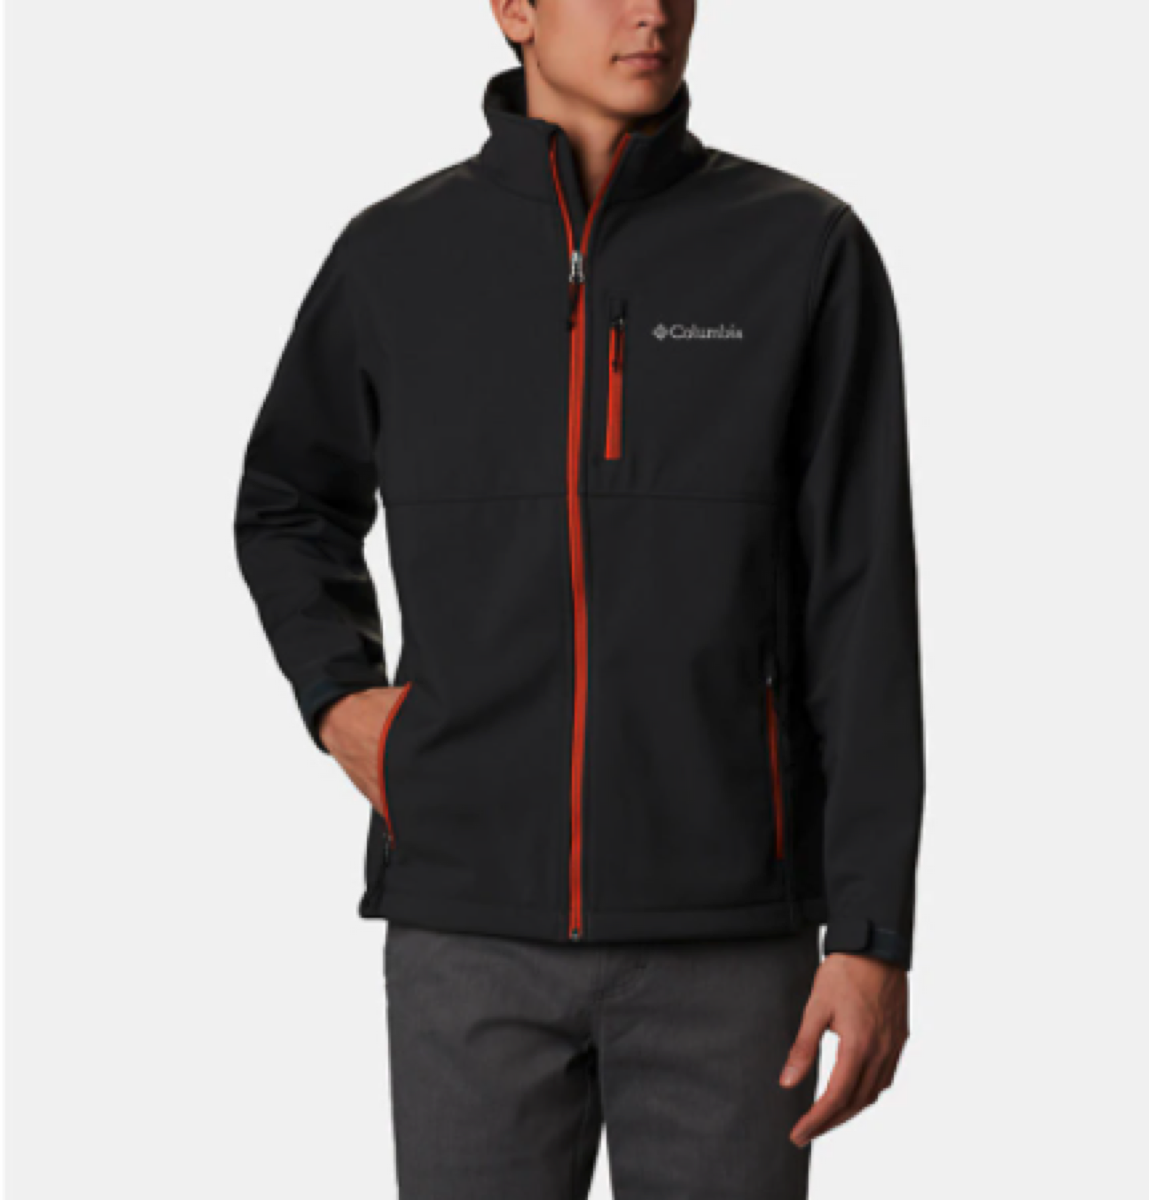 A black softshell jacket